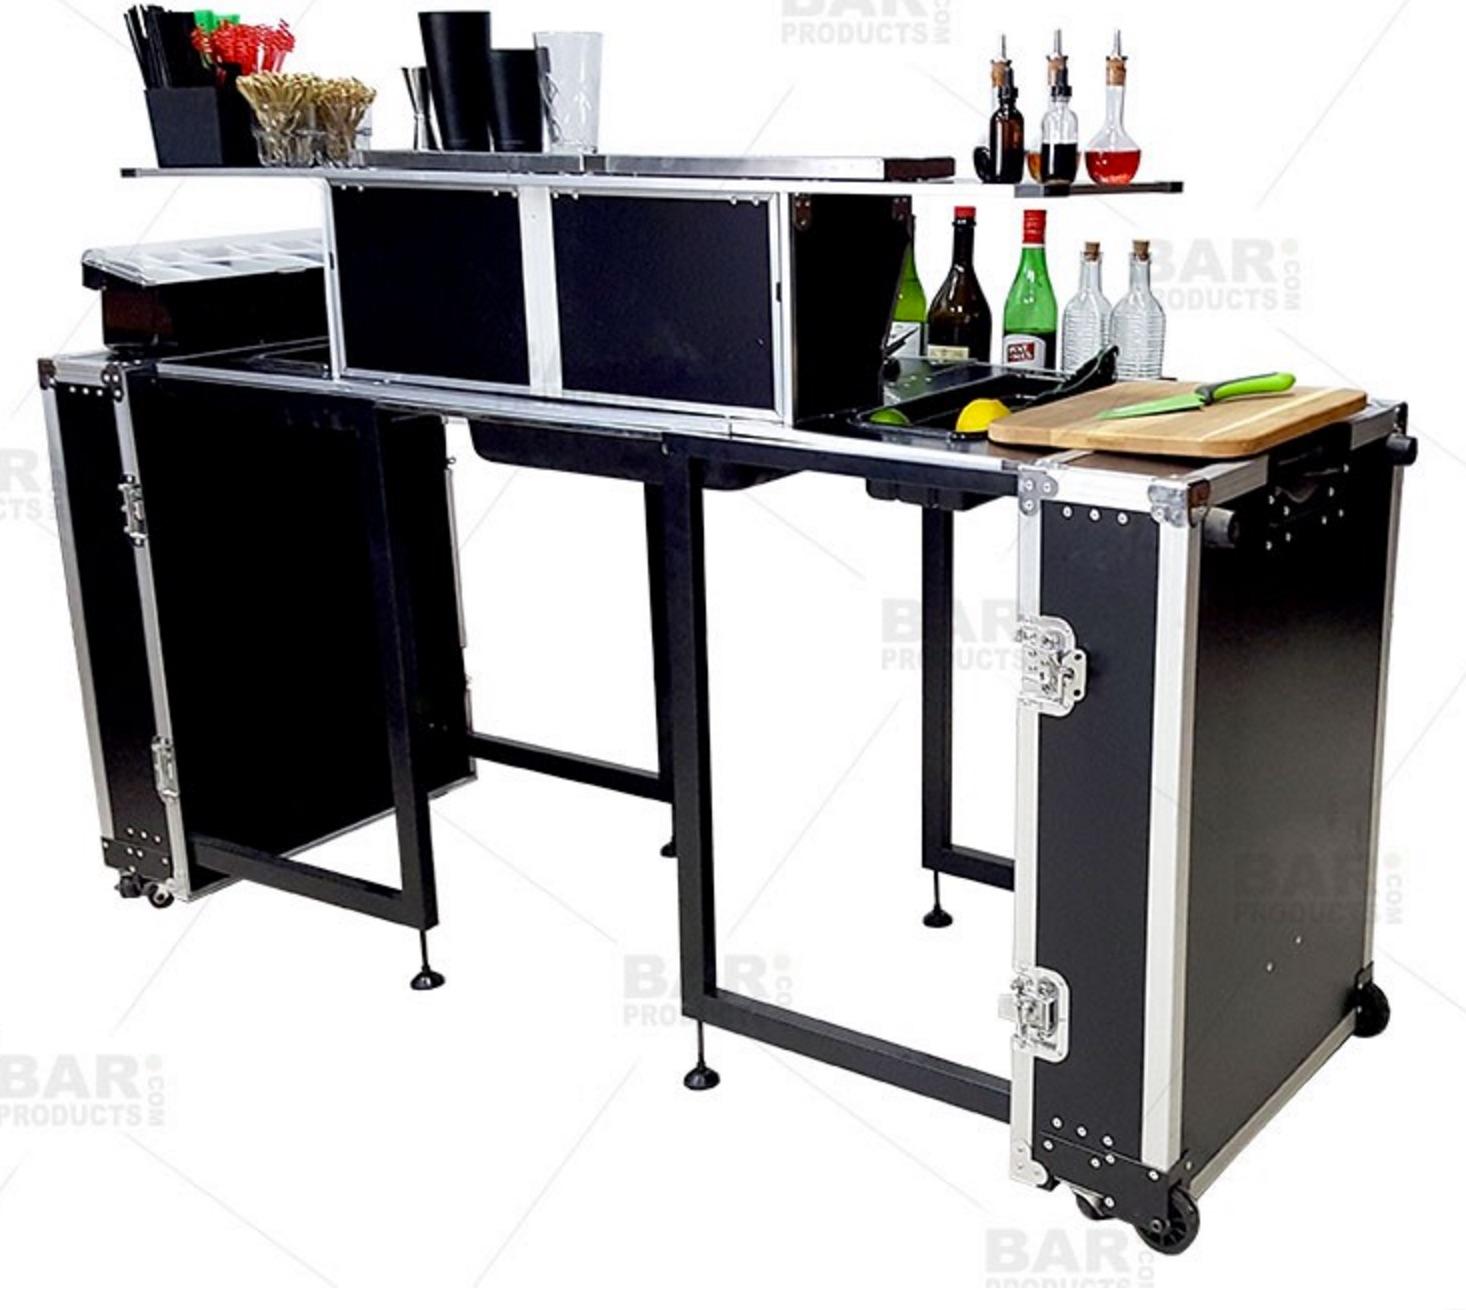 barconic portable bar